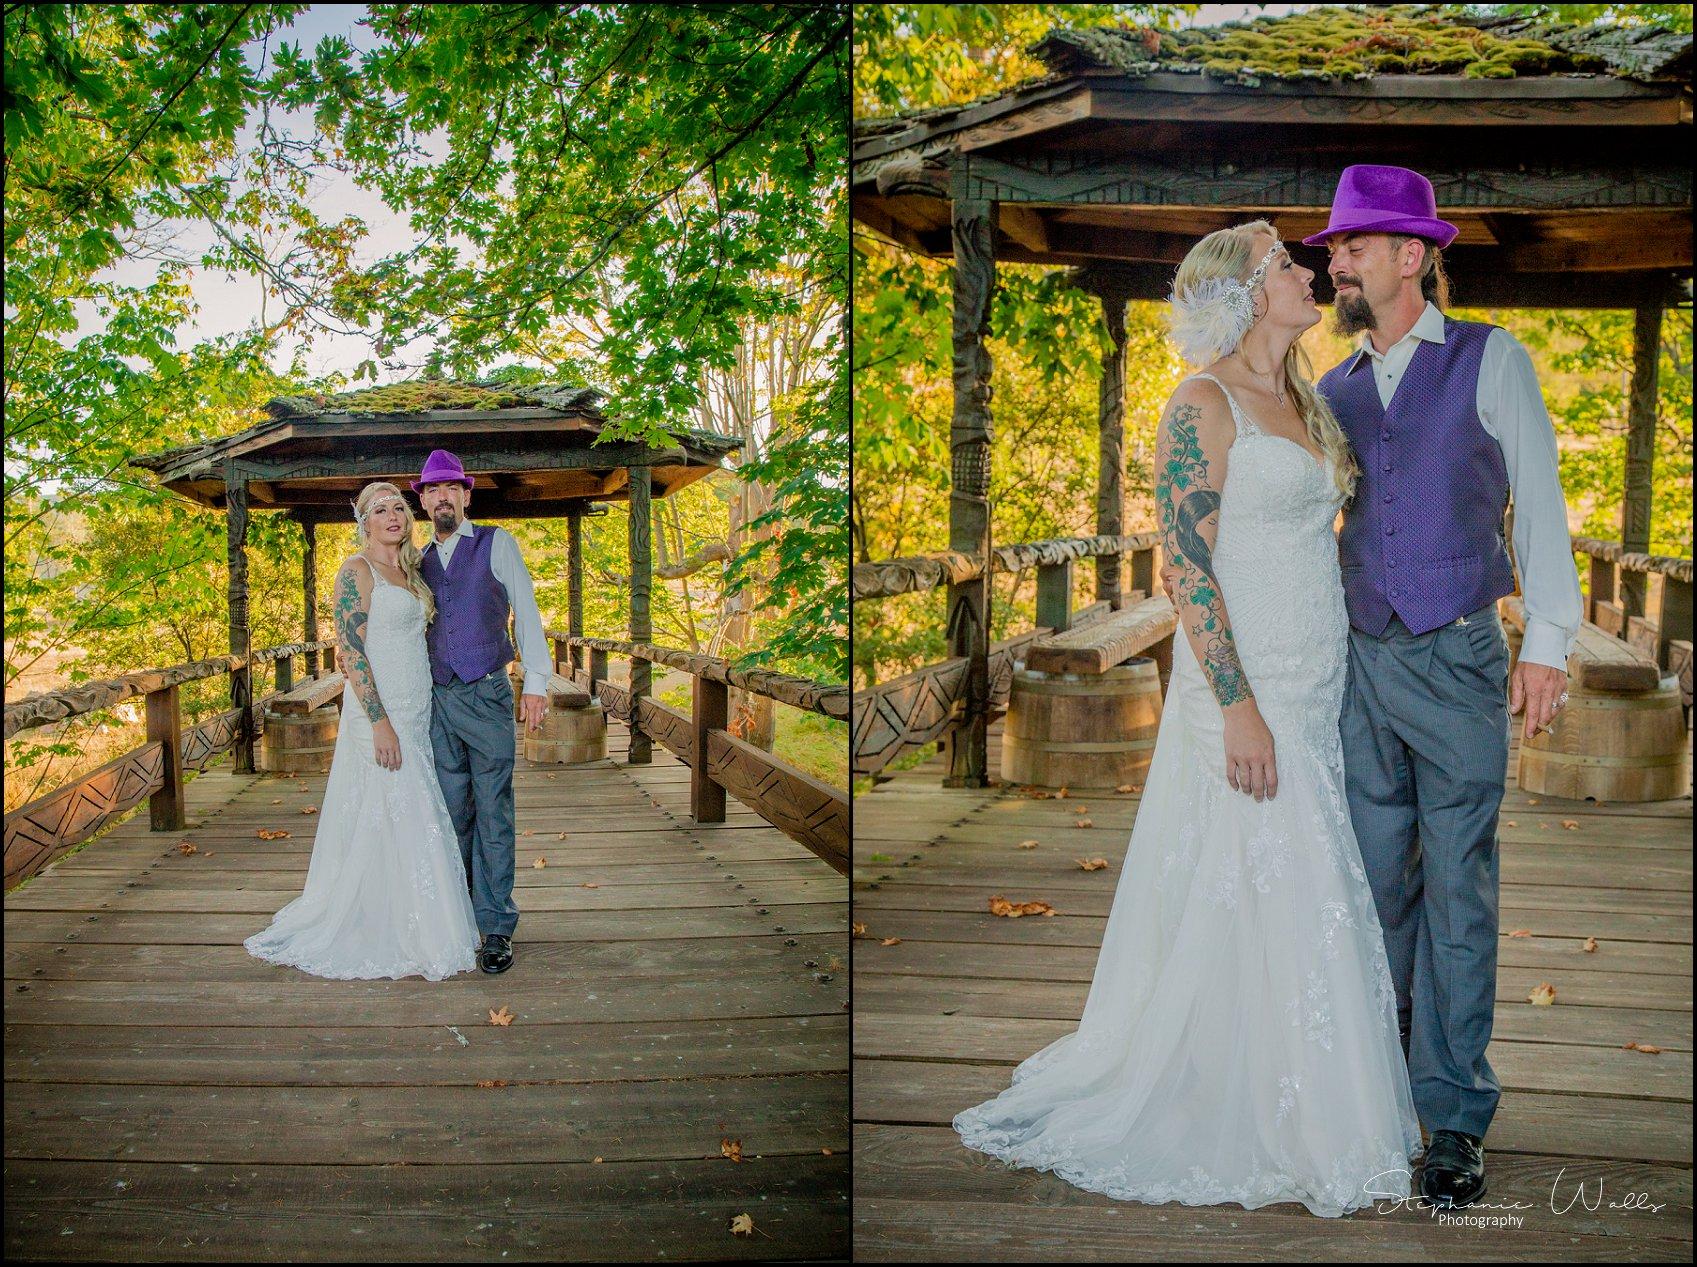 Everist Wedding 022 Patti & Bobbys | Troll Haven Castle & Bandy Farms | Sequim, Wa Wedding Photographer